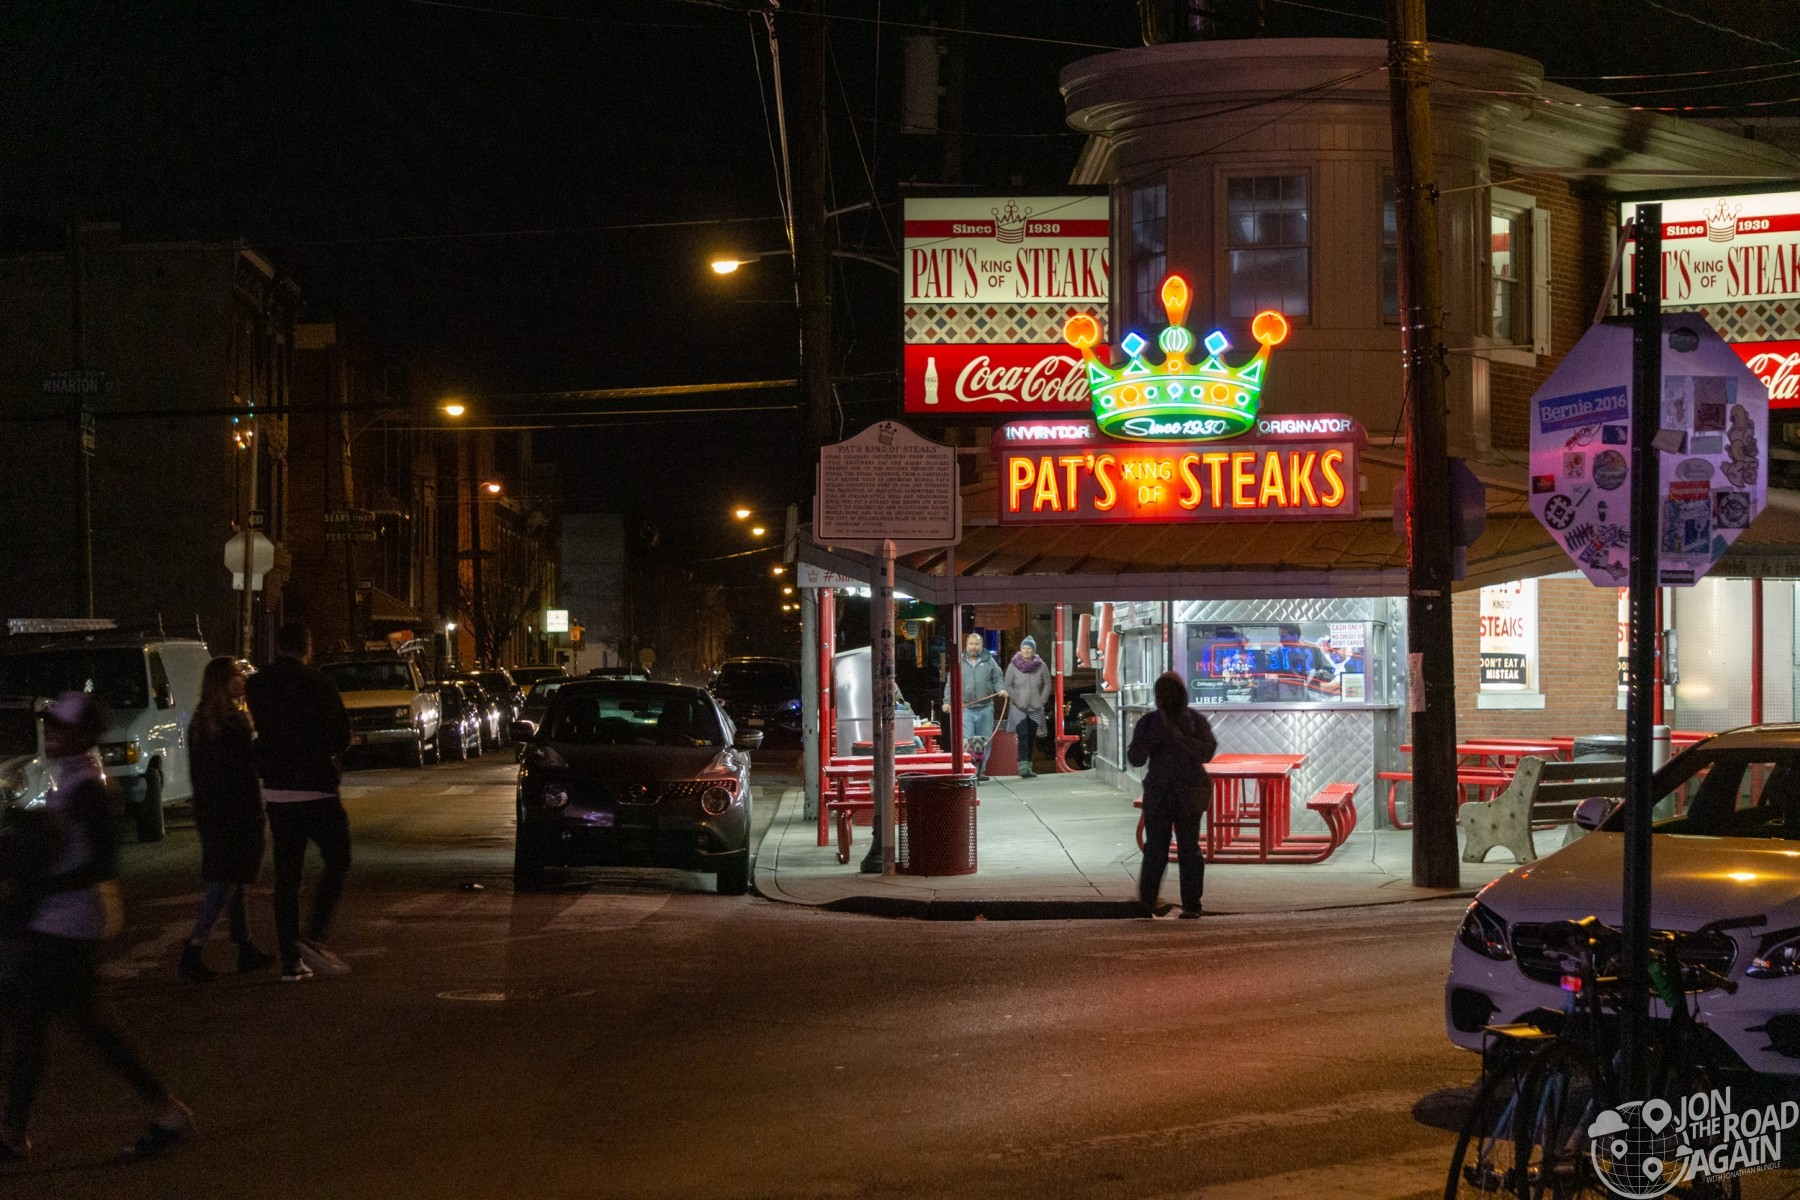 Pat's King of Steaks at Cheesesteak Corner